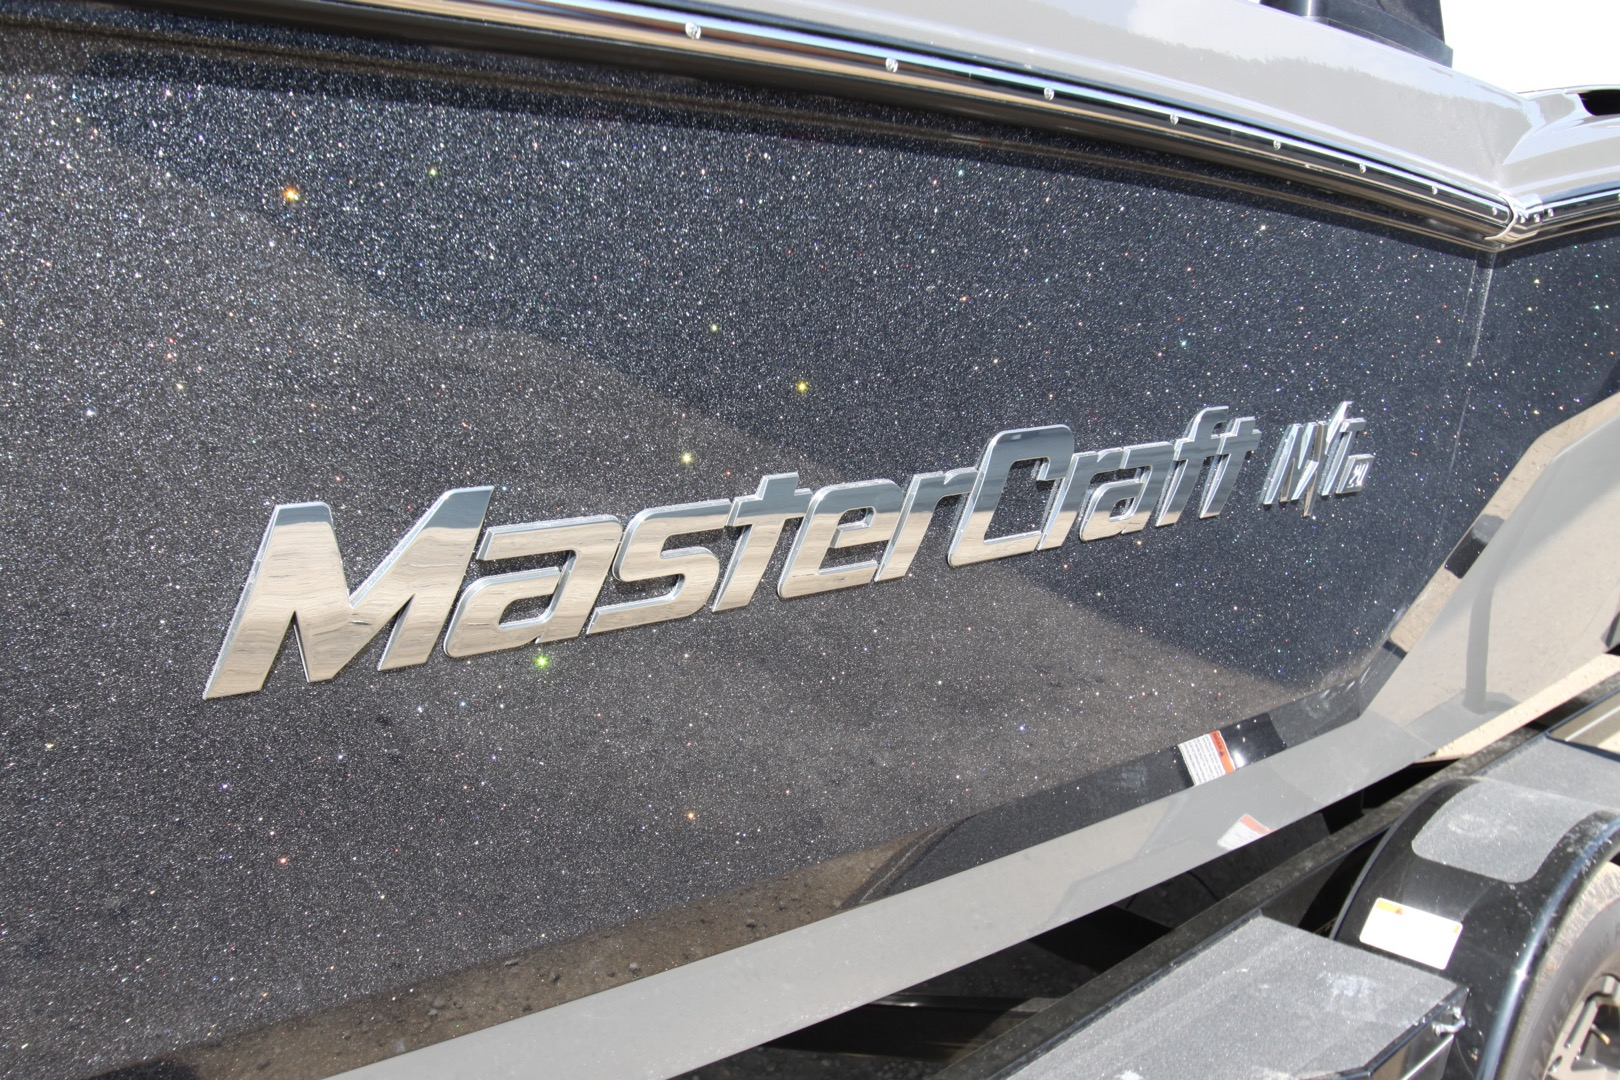 Mastercraft NXT 20 - IMG_0675